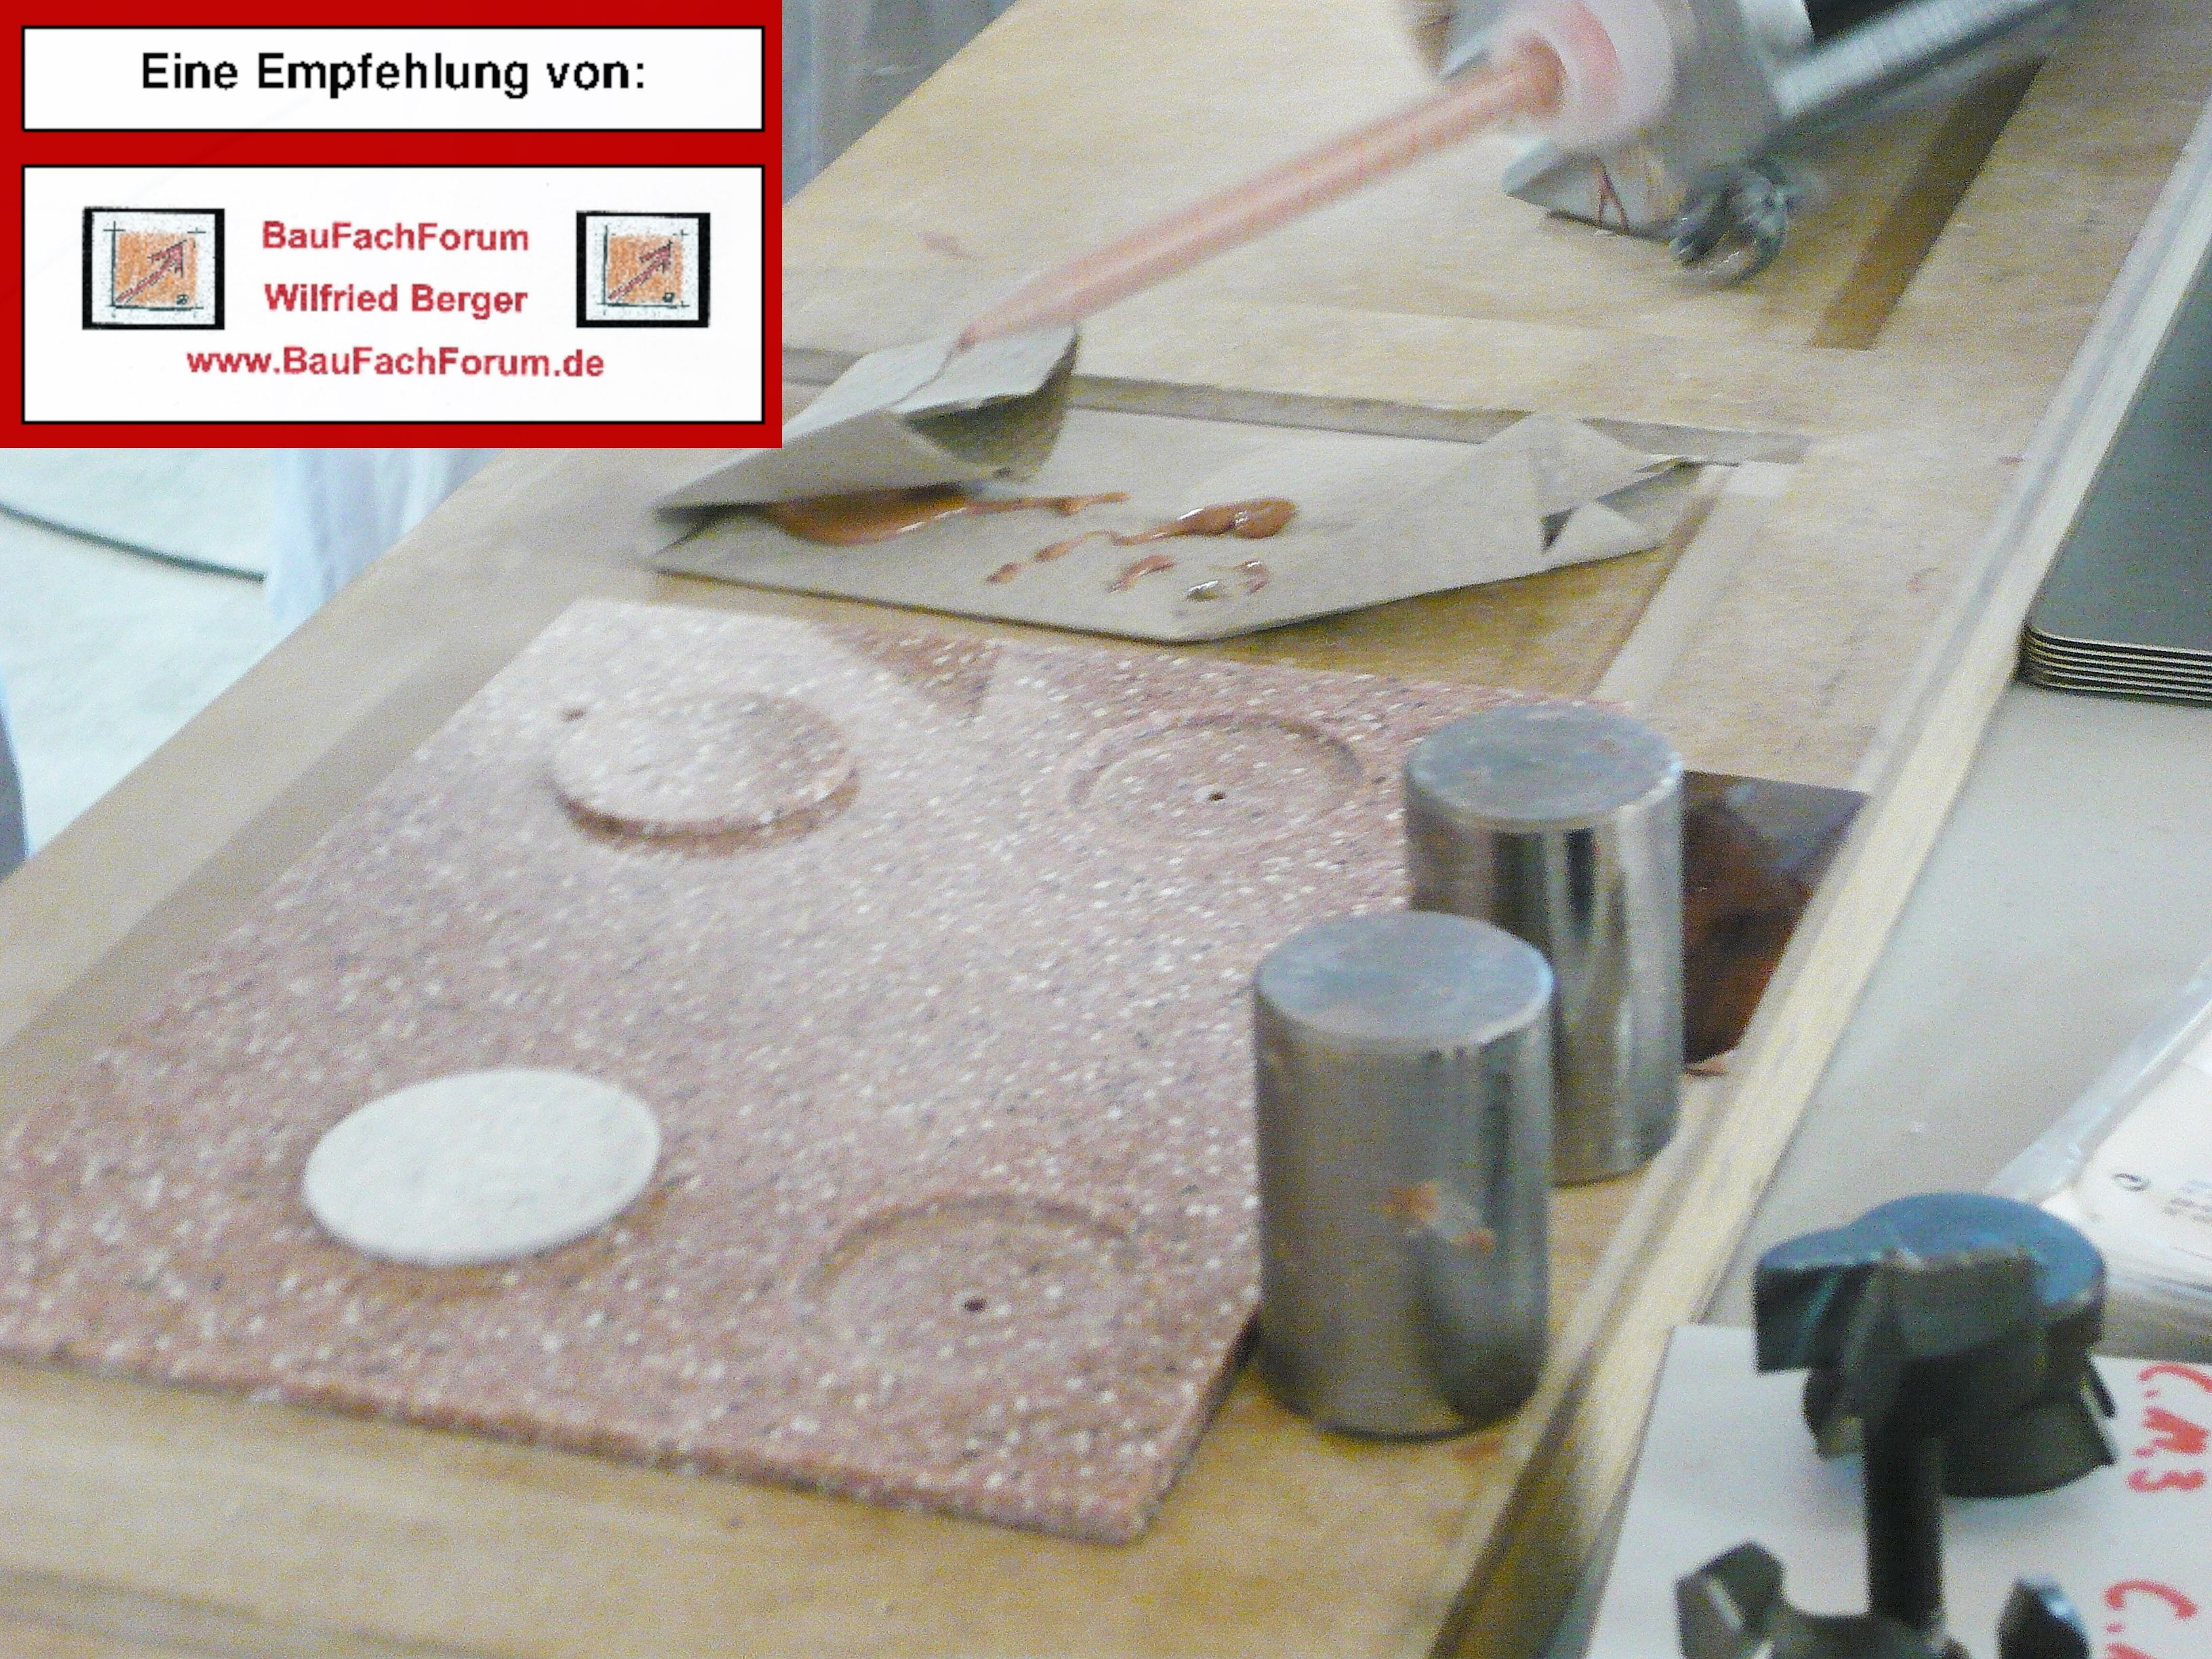 Baufa Fensterbauer Fortbildung Und Holzbearbeitungsmaschinen